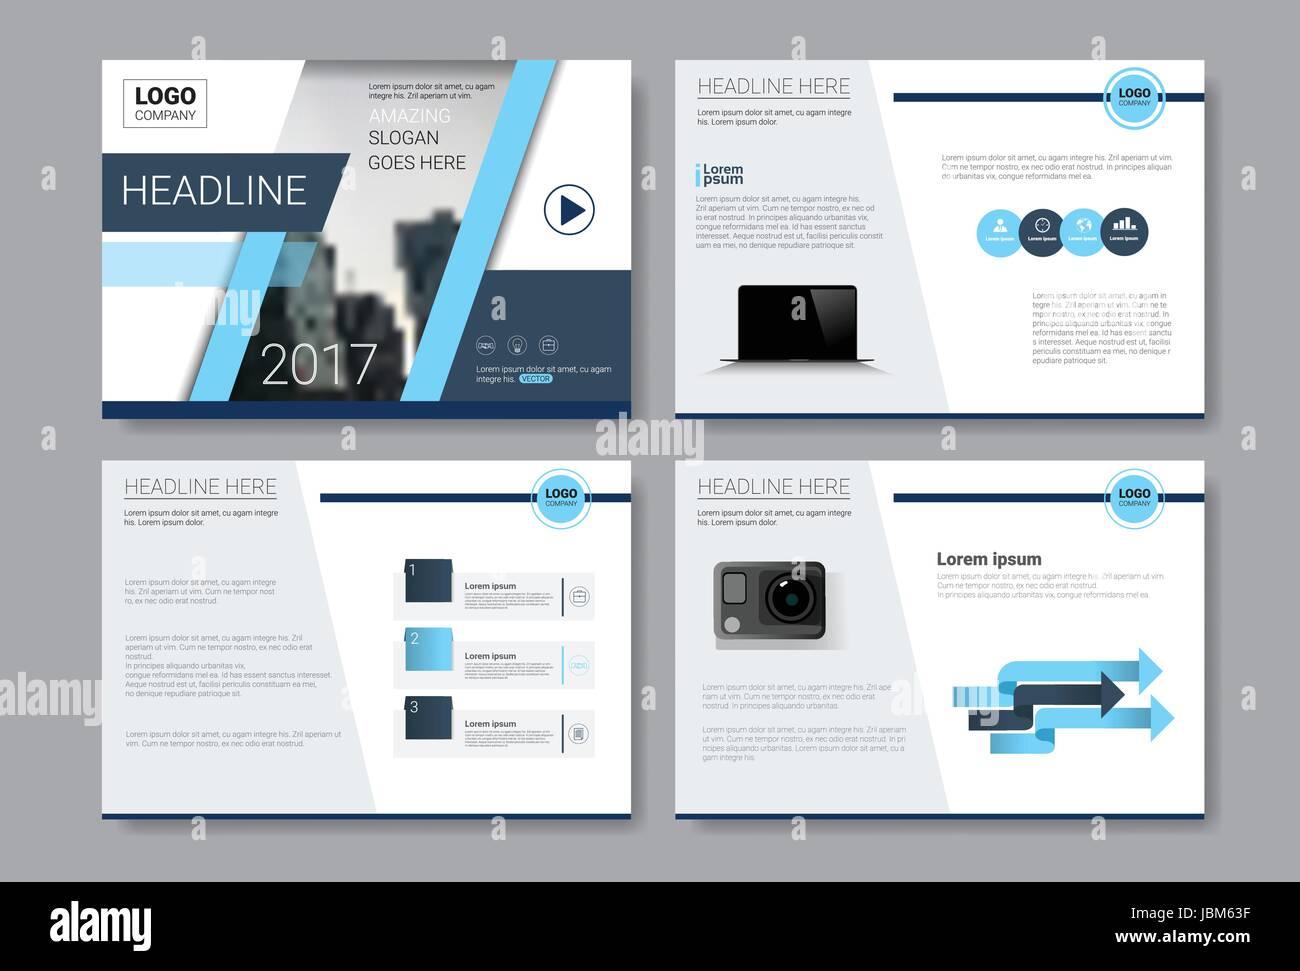 Template Design Brochure Annual Report Magazine Poster Corporate Presentation Portfolio Flyer Set With Copy Space